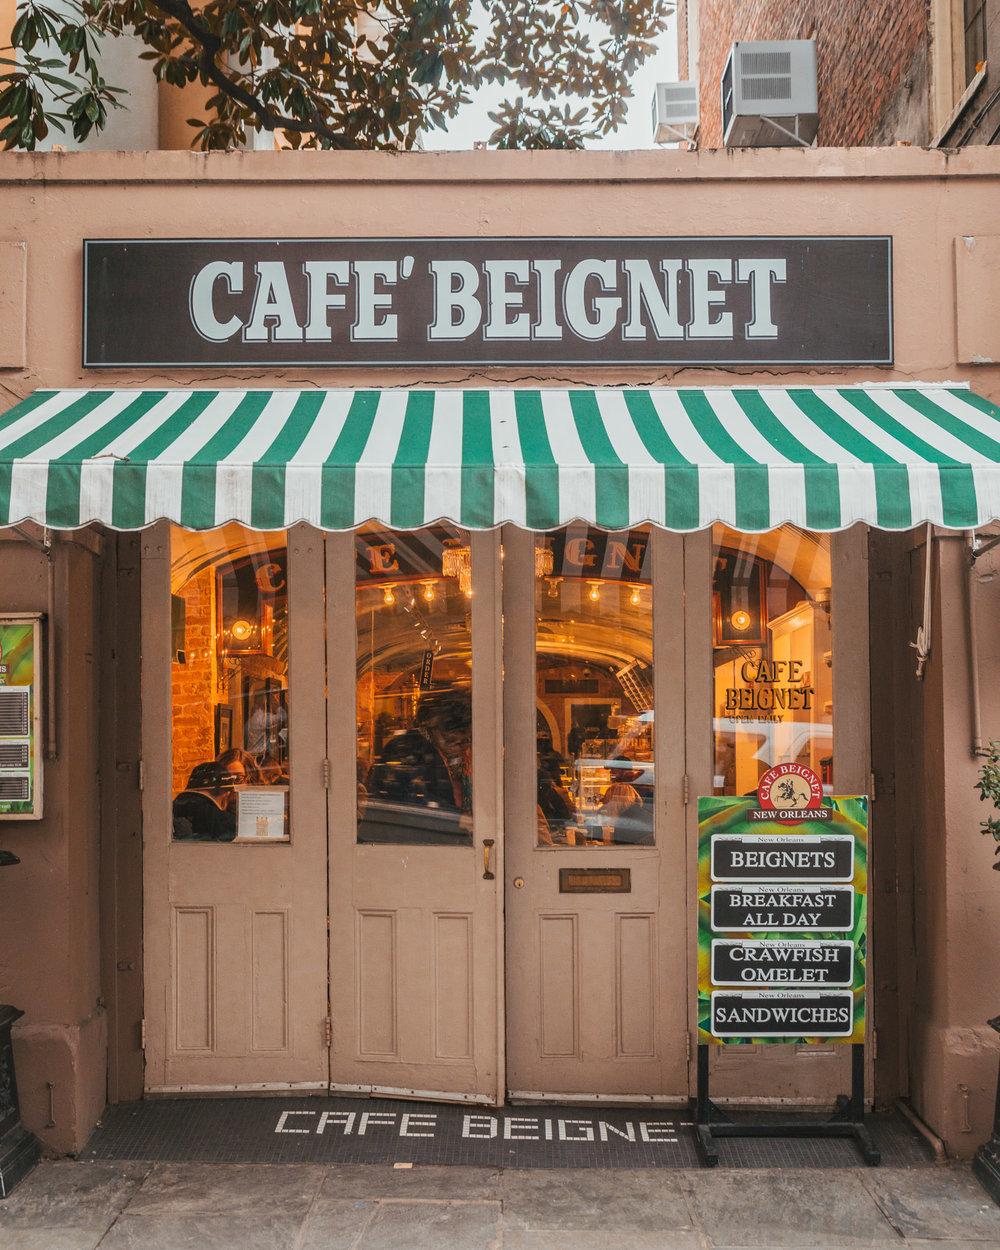 Cafe Beignet cute storefront // The Most Instagrammable Spots in New Orleans // #readysetjetset www.readysetjetset.net